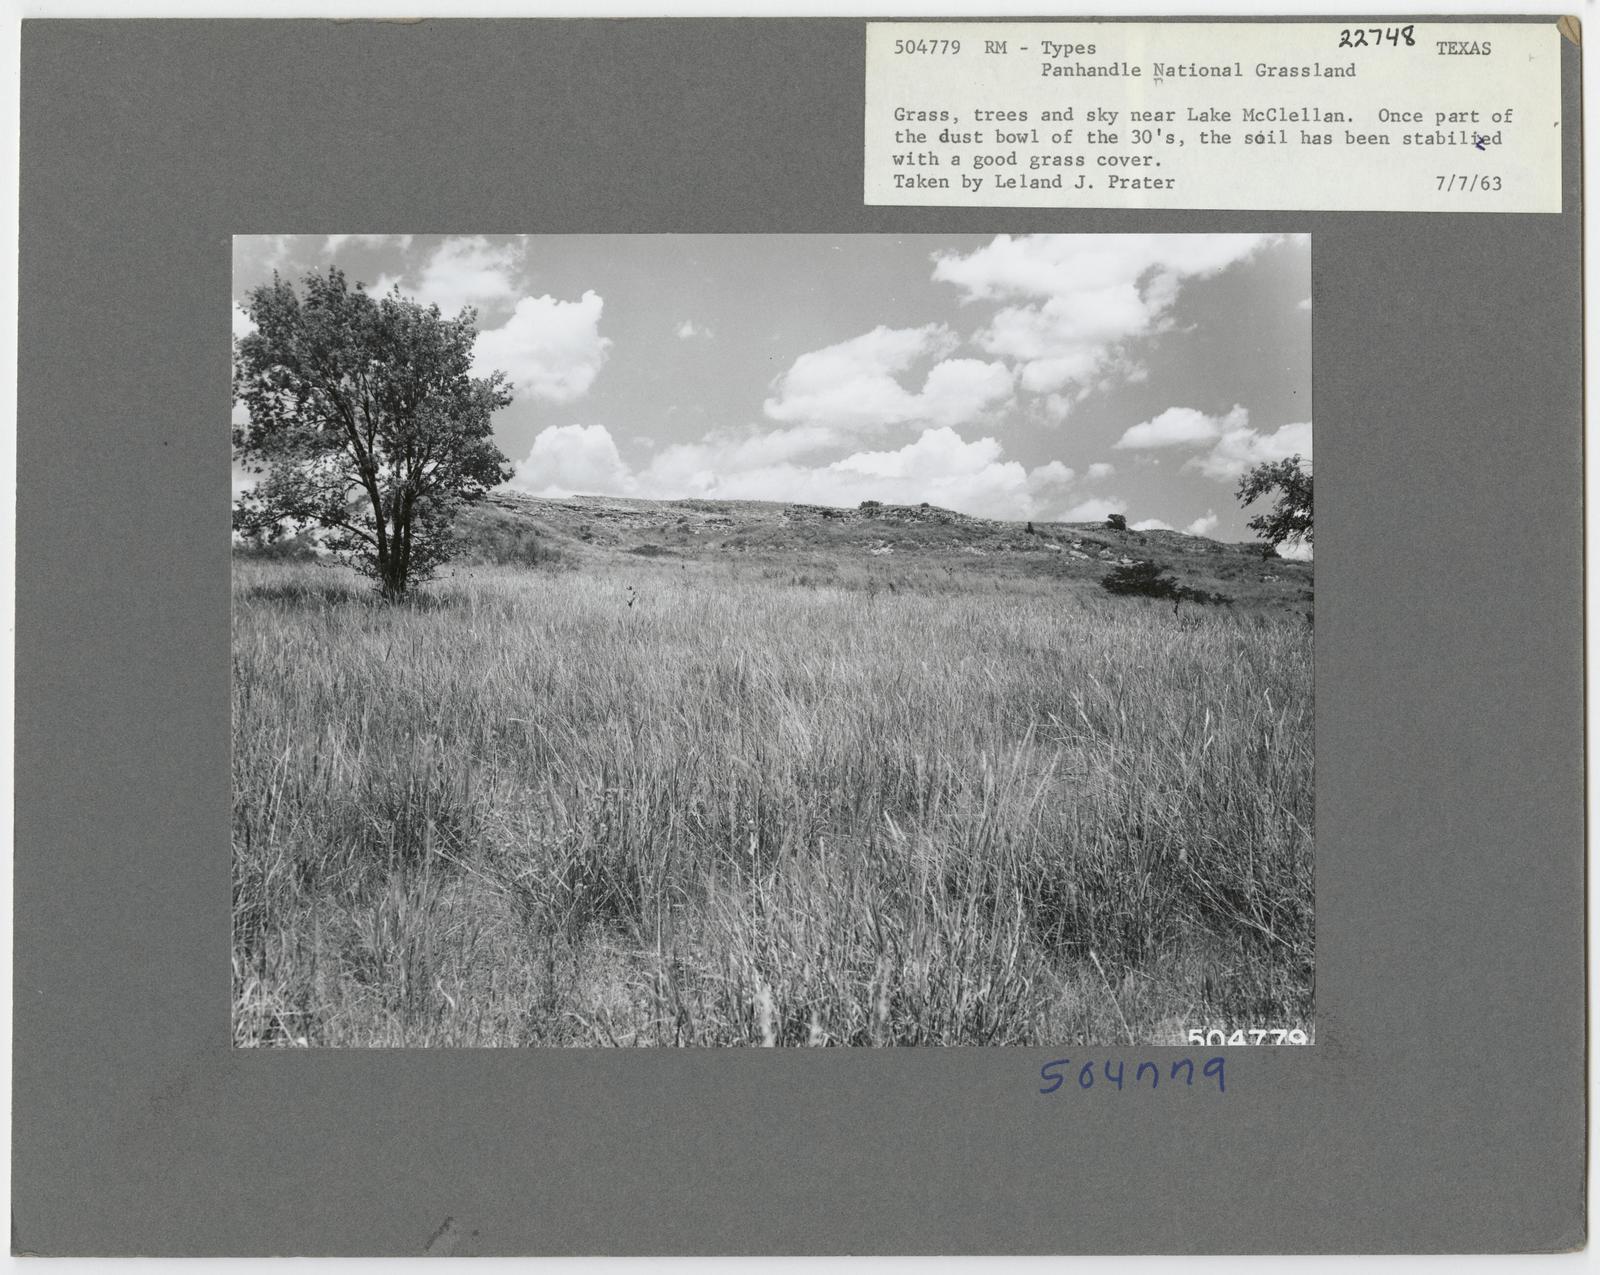 Range Revegetation - Plant Control - Texas